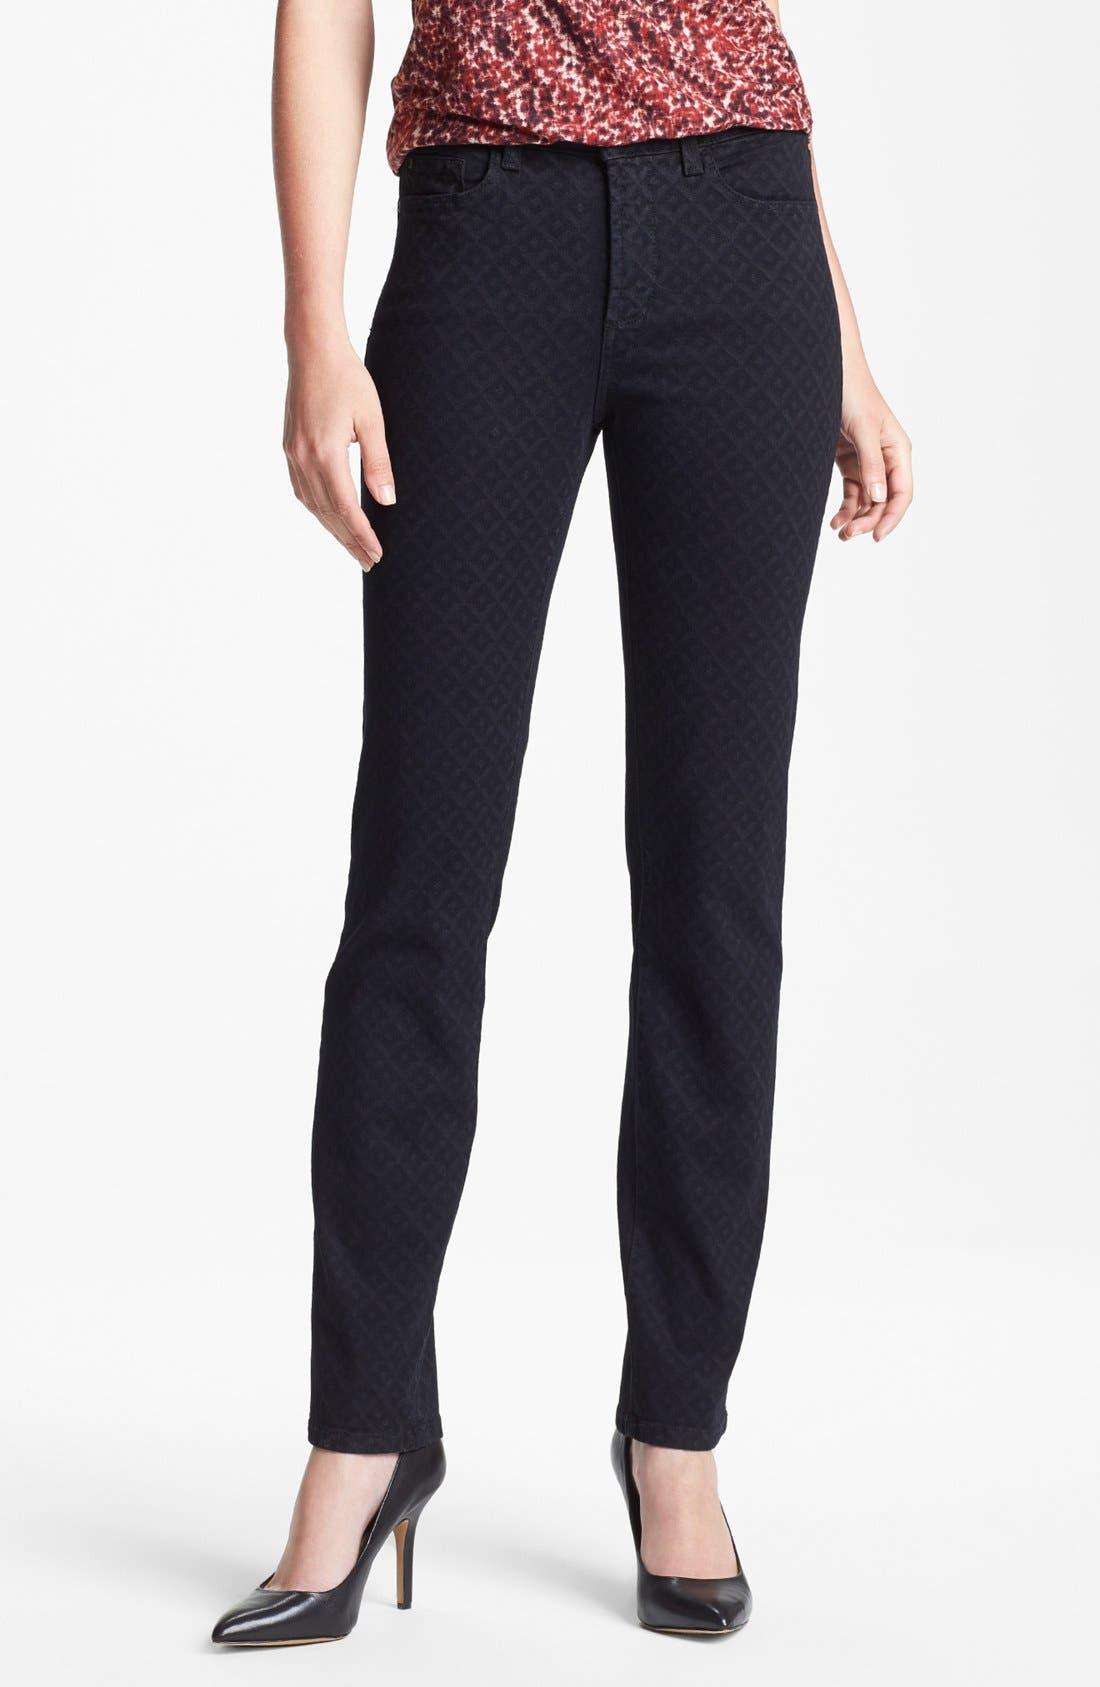 Alternate Image 1 Selected - NYDJ 'Sheri' Print Stretch Skinny Jeans (Regular & Petite)